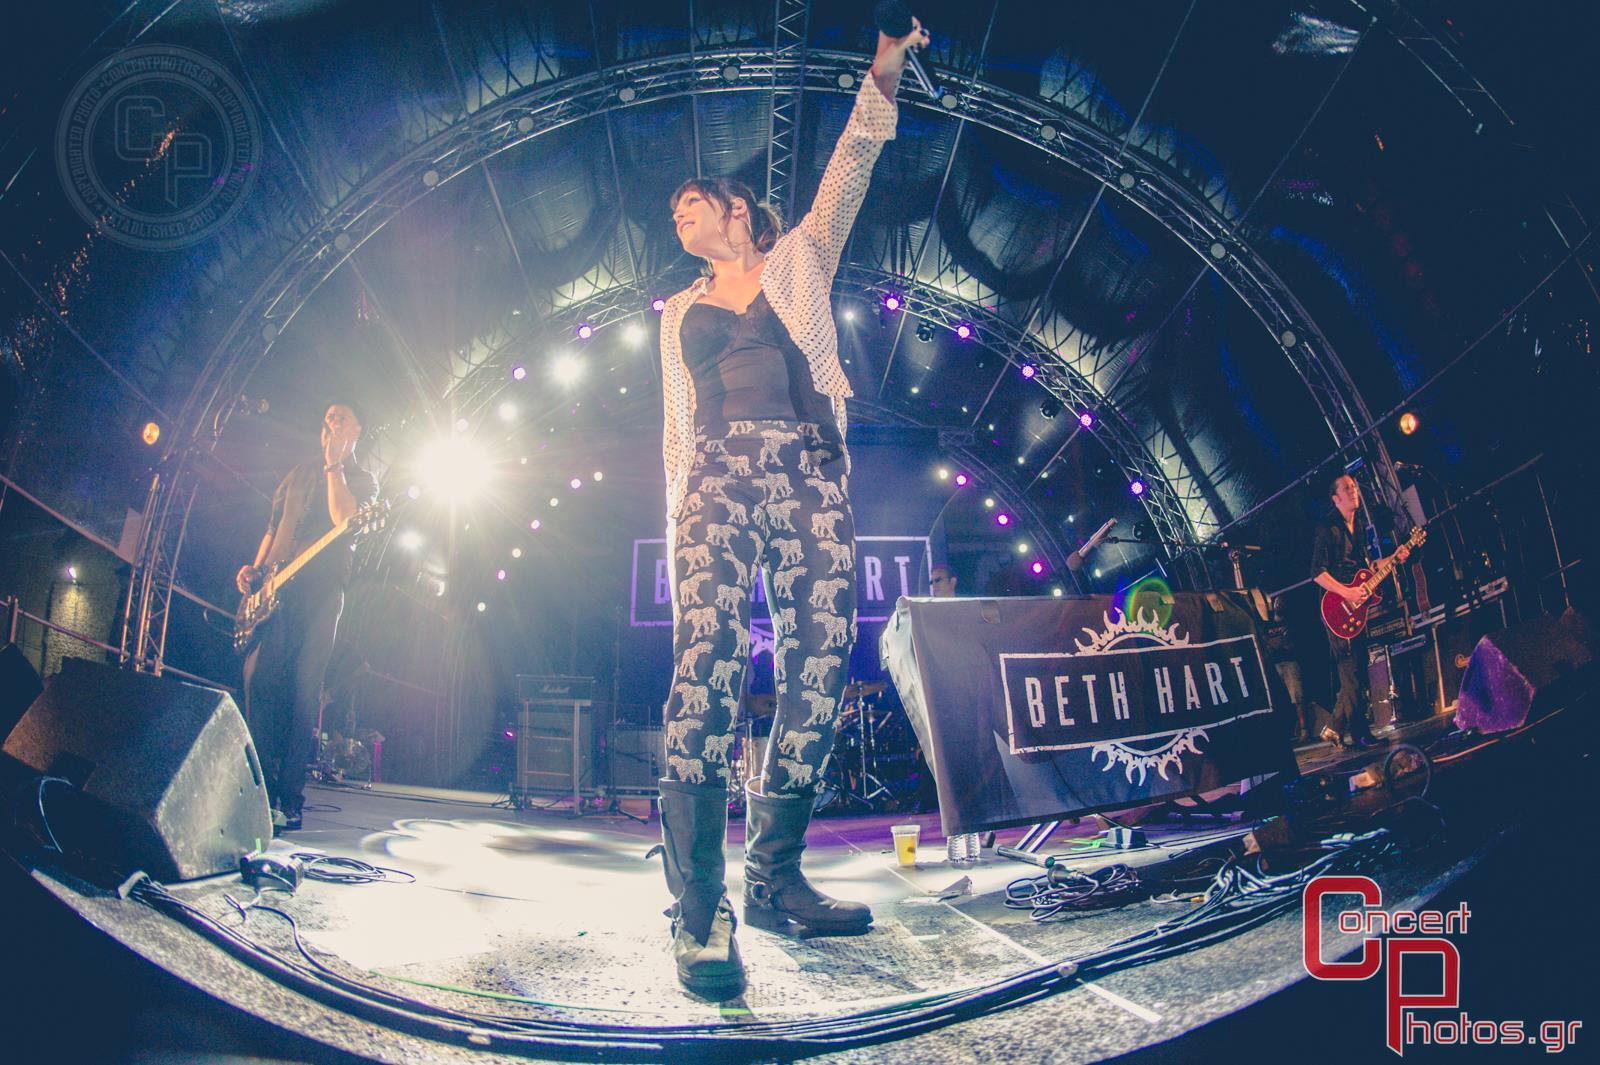 Beth Hart-Beth Hart photographer:  - concertphotos_20150630_20_35_29